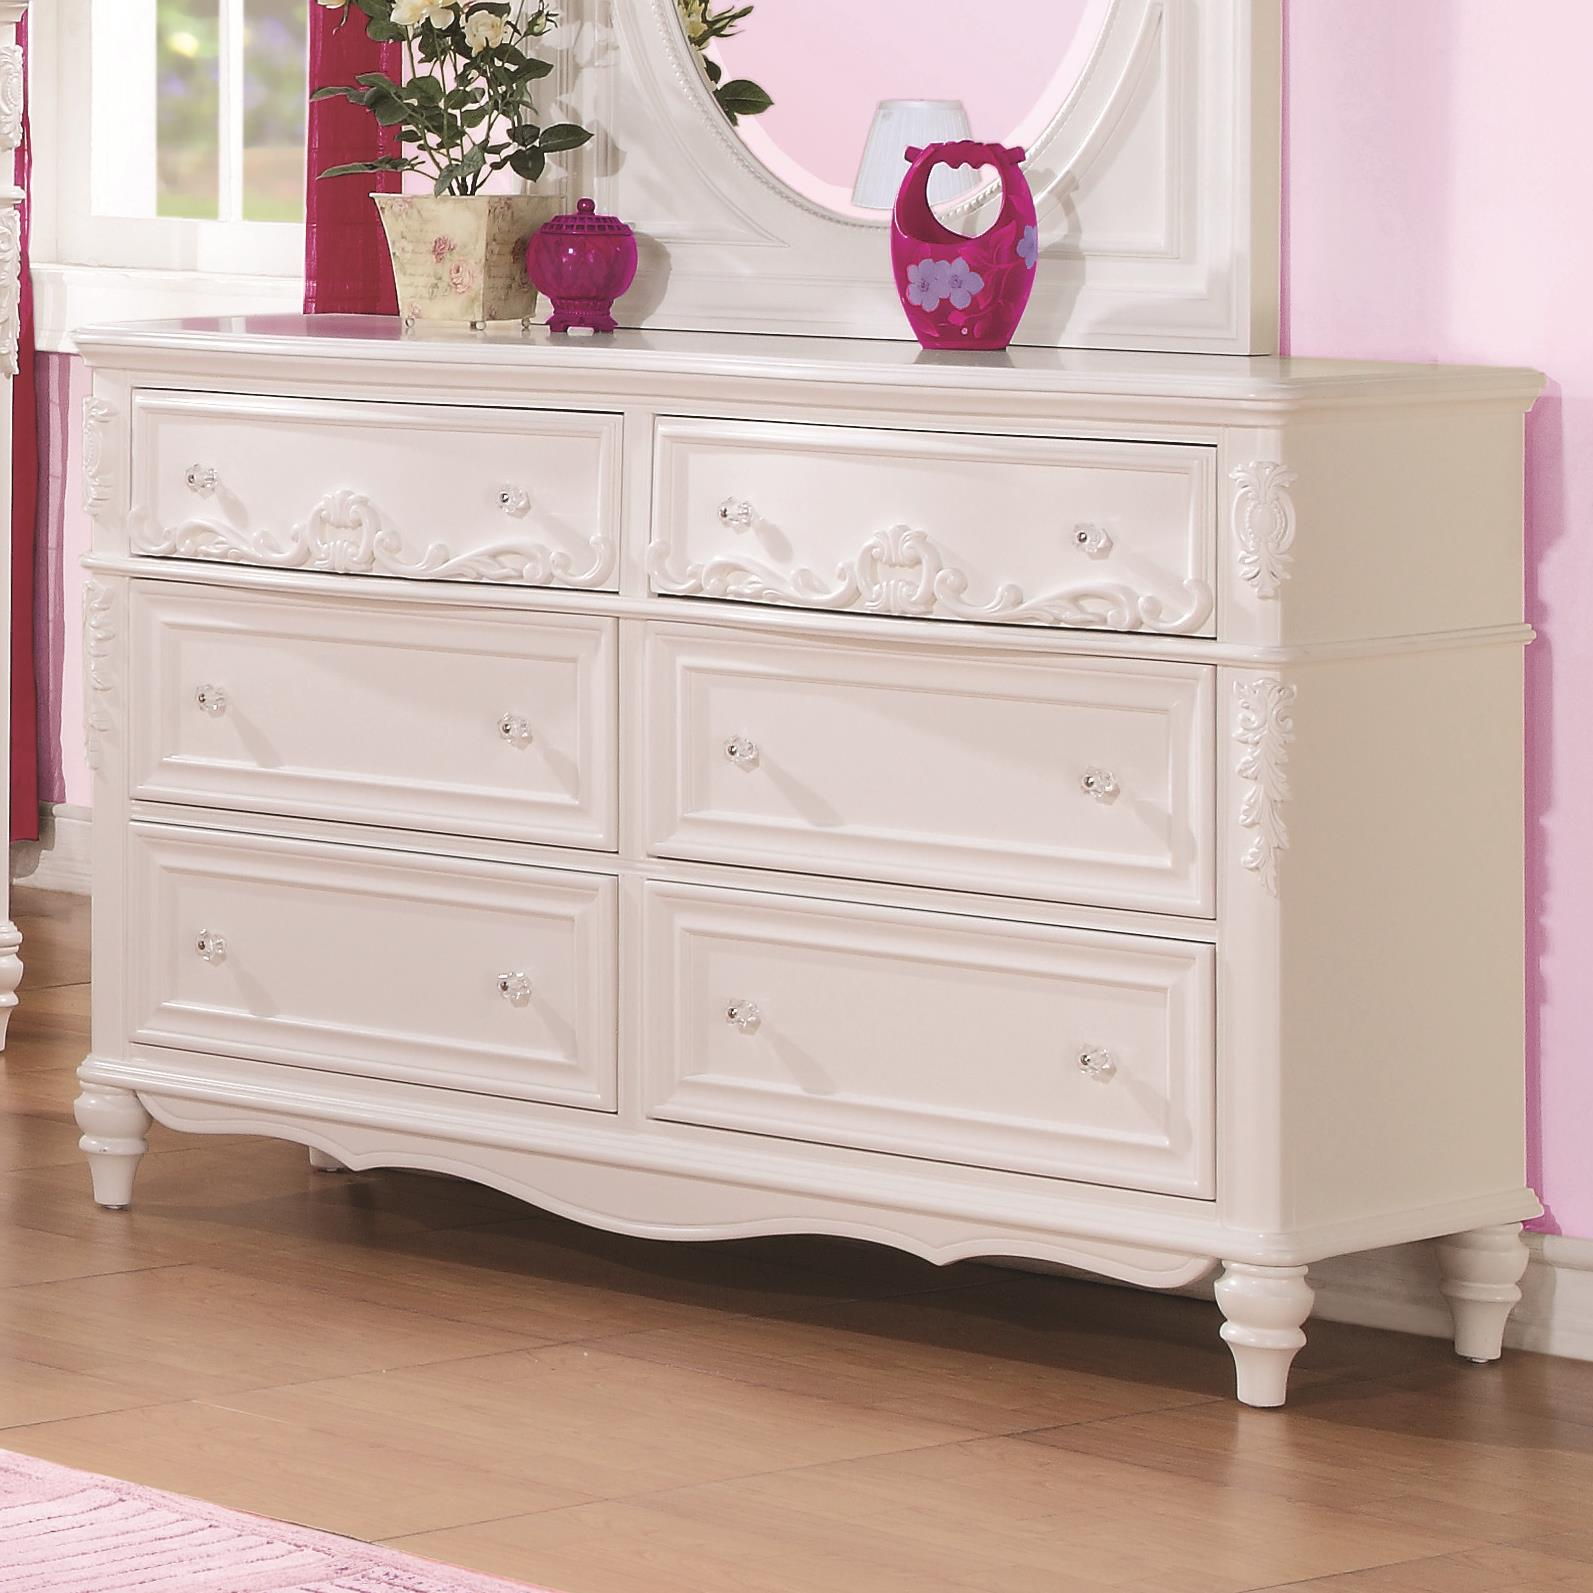 Caroline Dresser by Coaster at Northeast Factory Direct